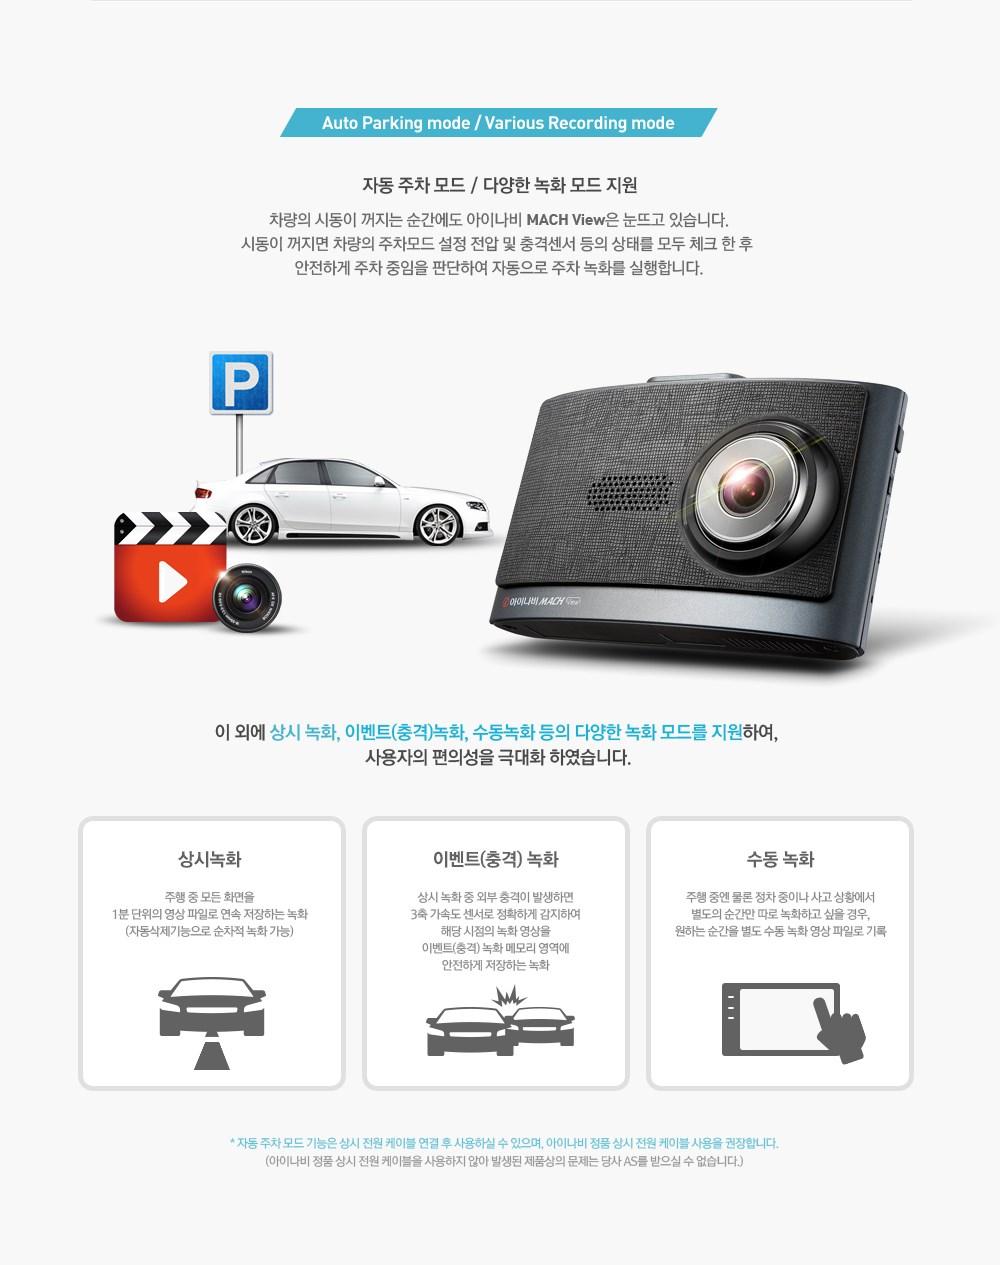 Auto Parking mode / Various Recording mode